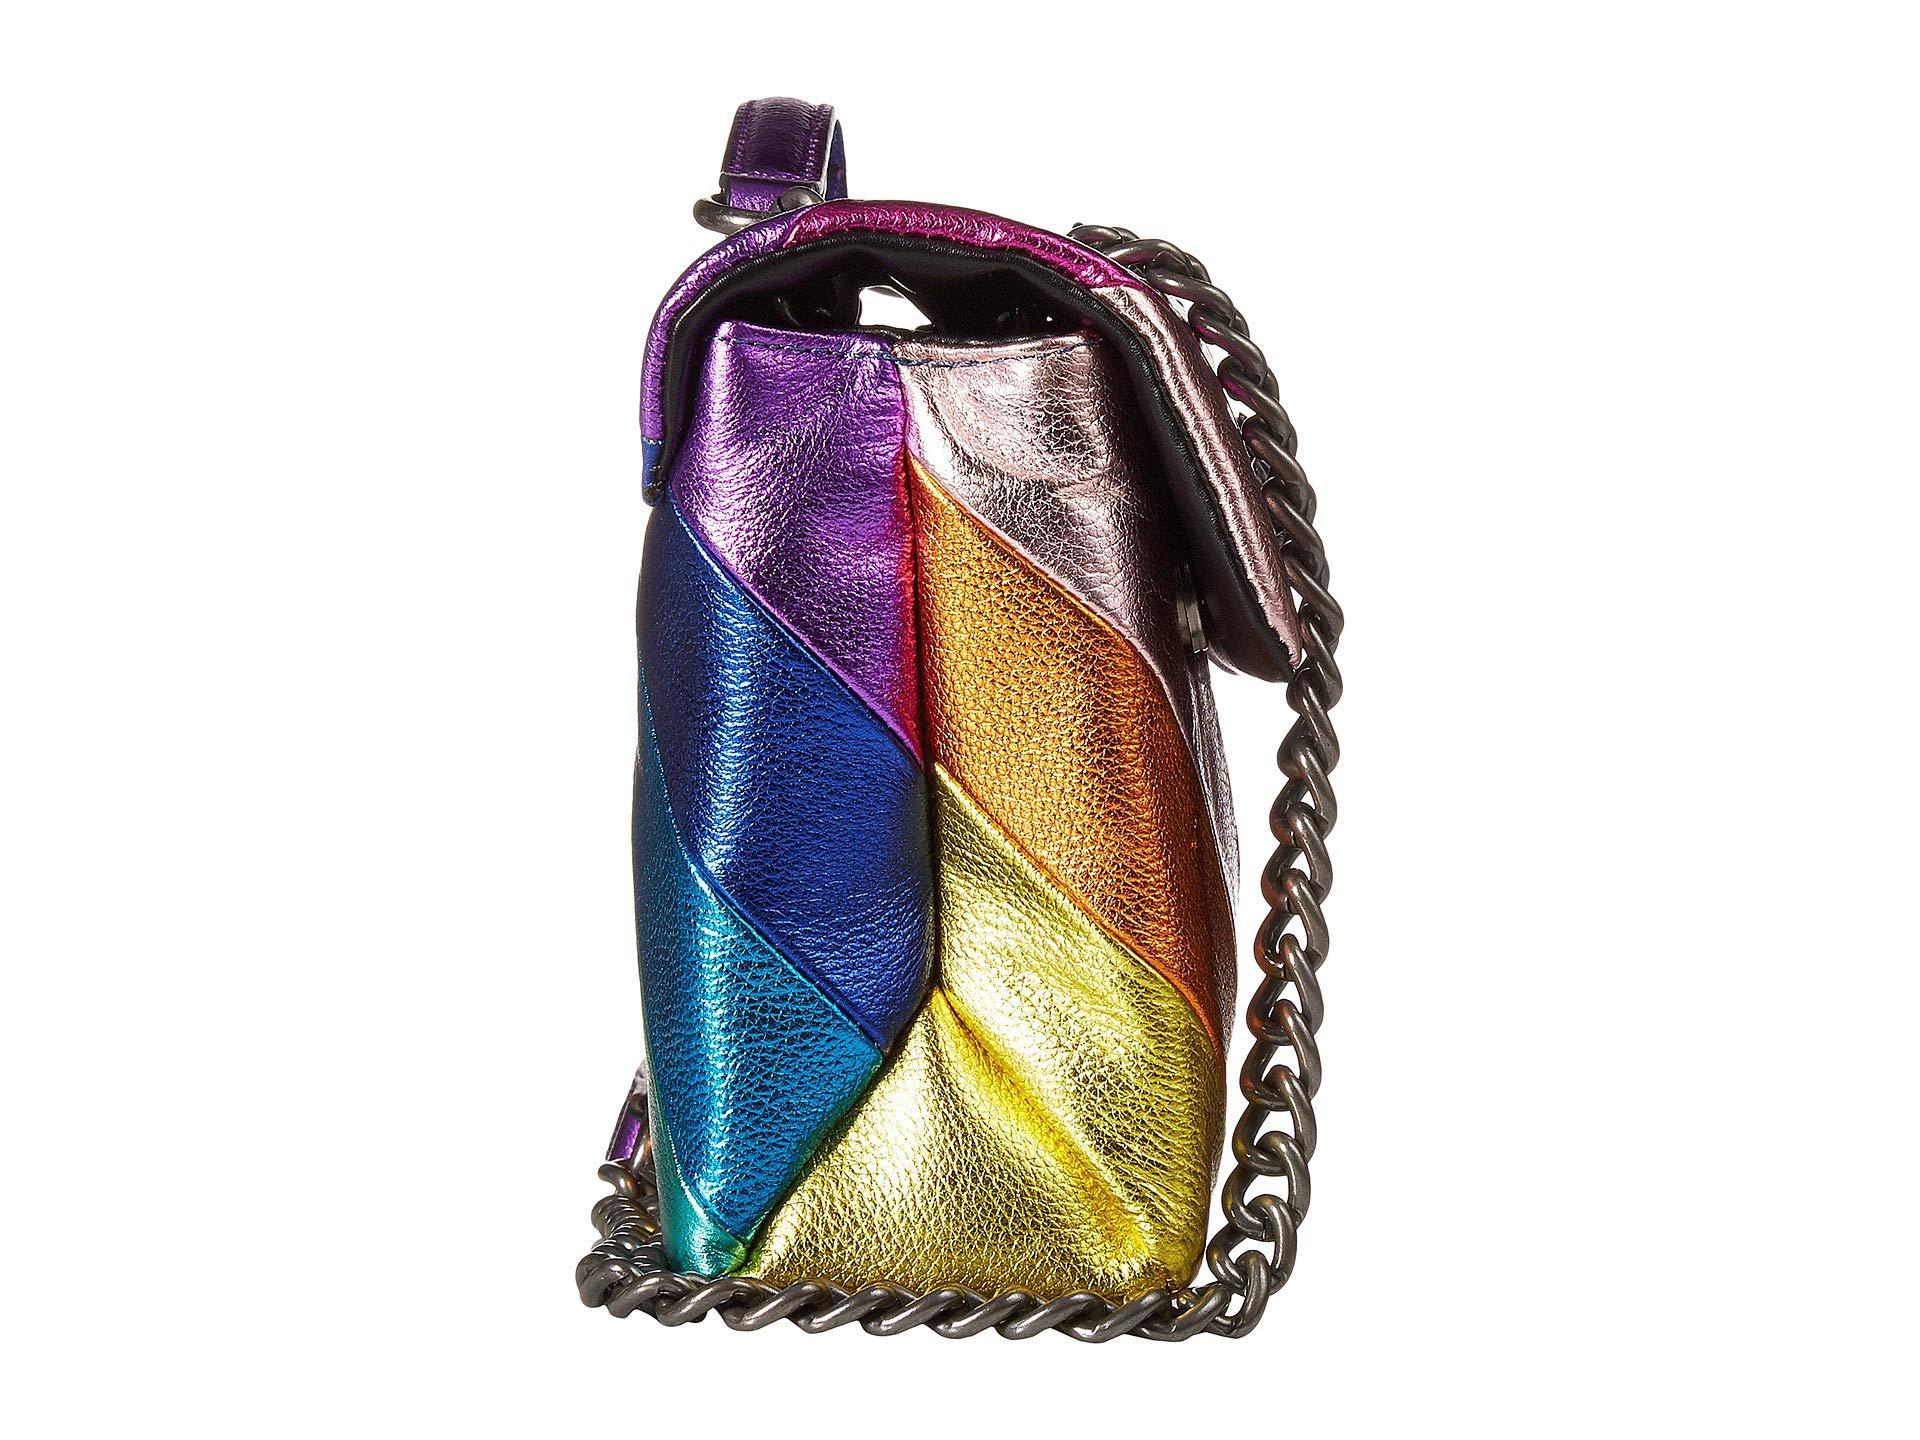 1239d0086c1 Kurt Geiger Kensington Shoulder Bag (multi/other) Handbags - Lyst